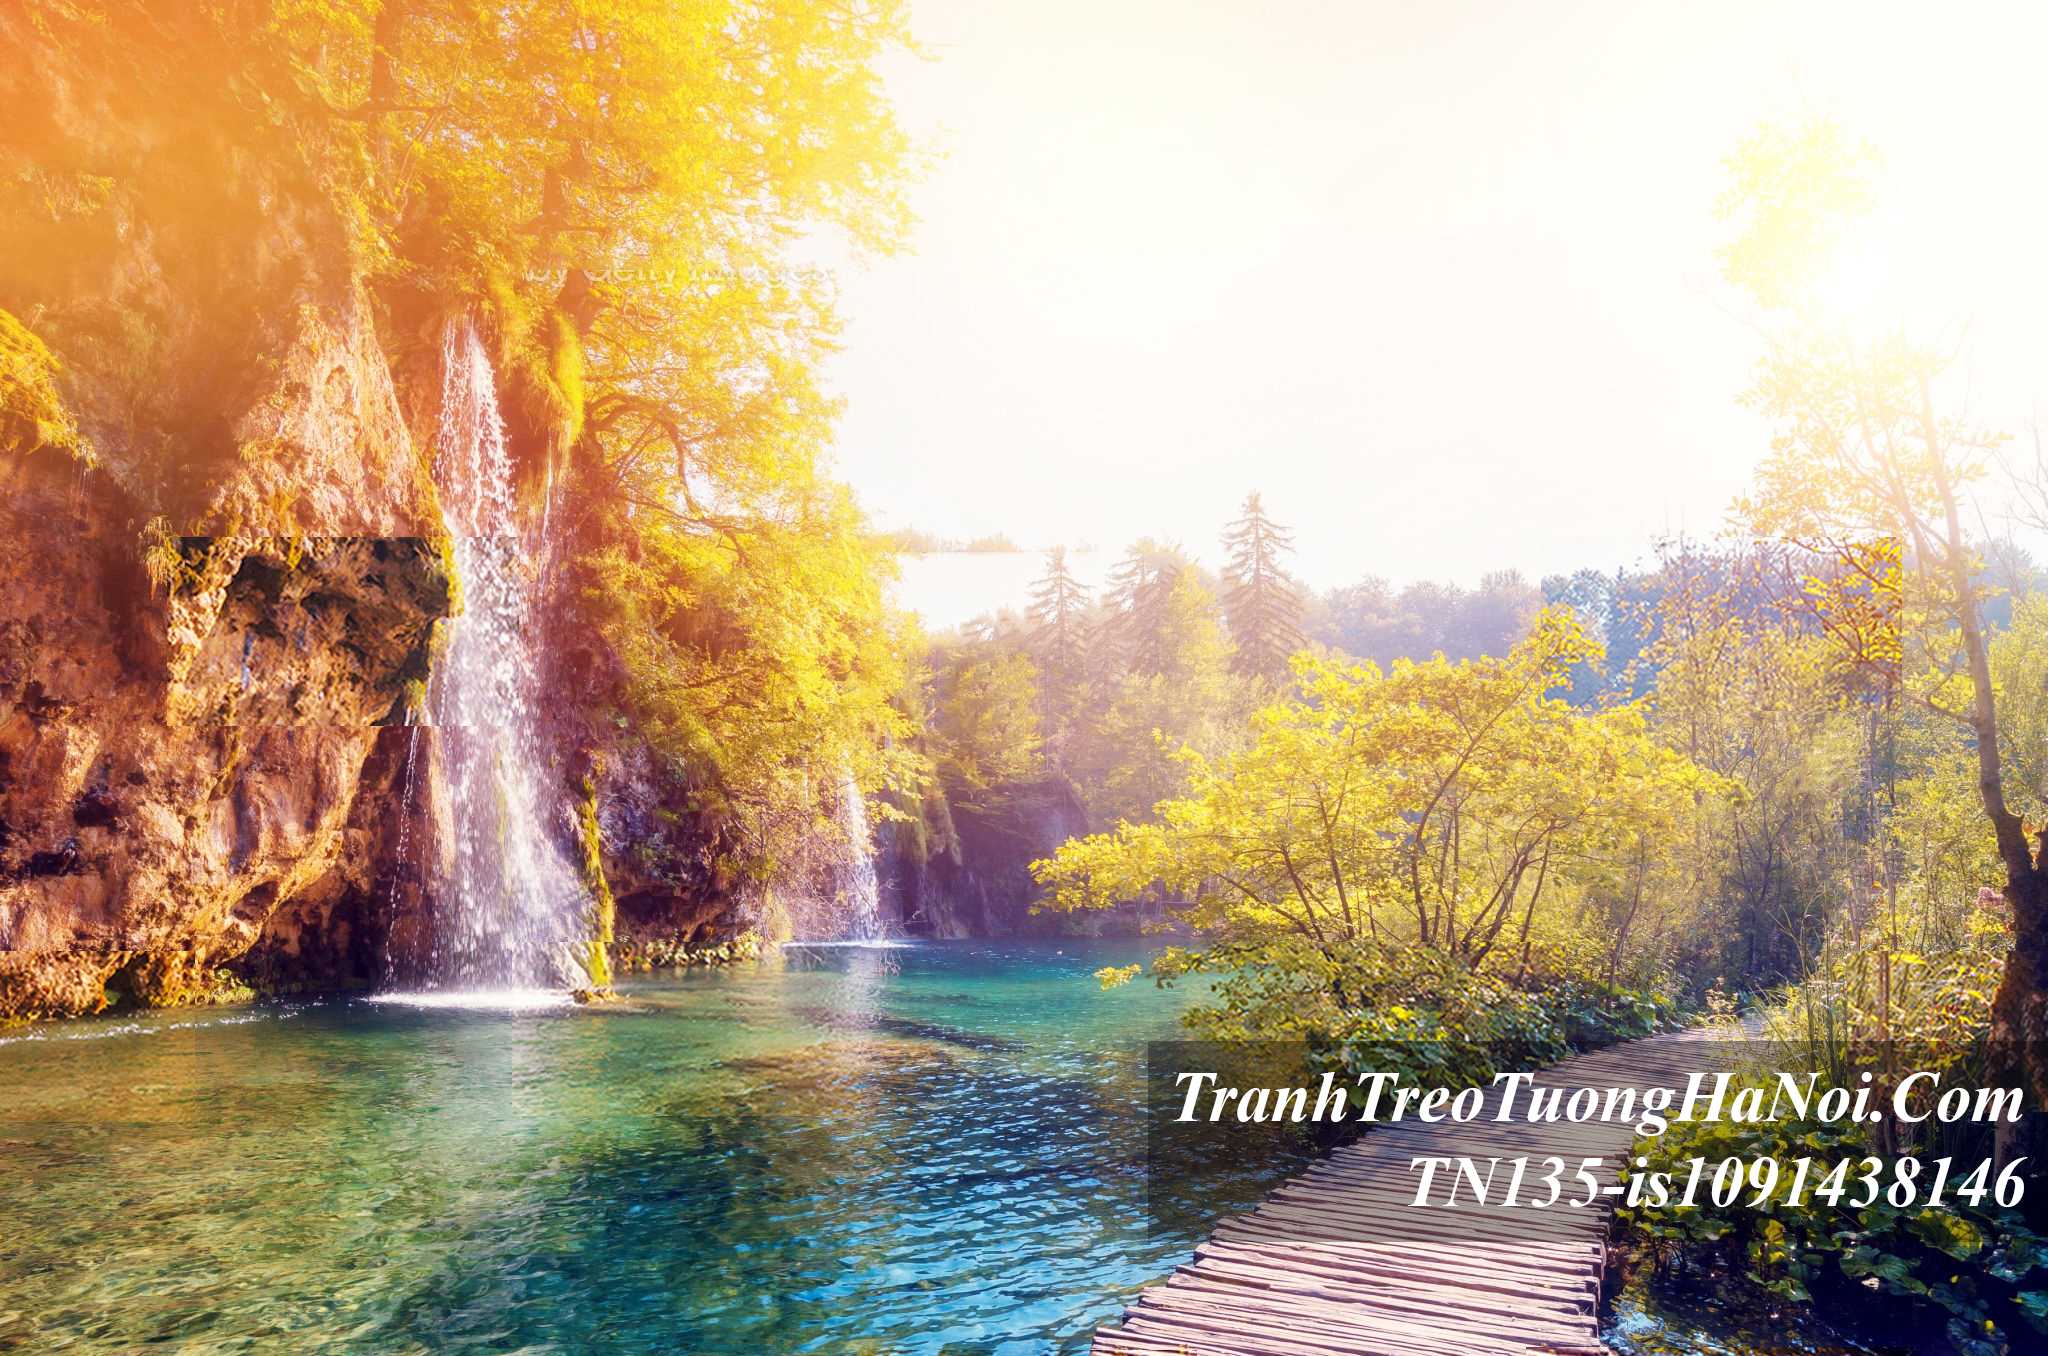 Tranh phong canh thac nuoc mua thu TN135-is1091438146 o Croatia